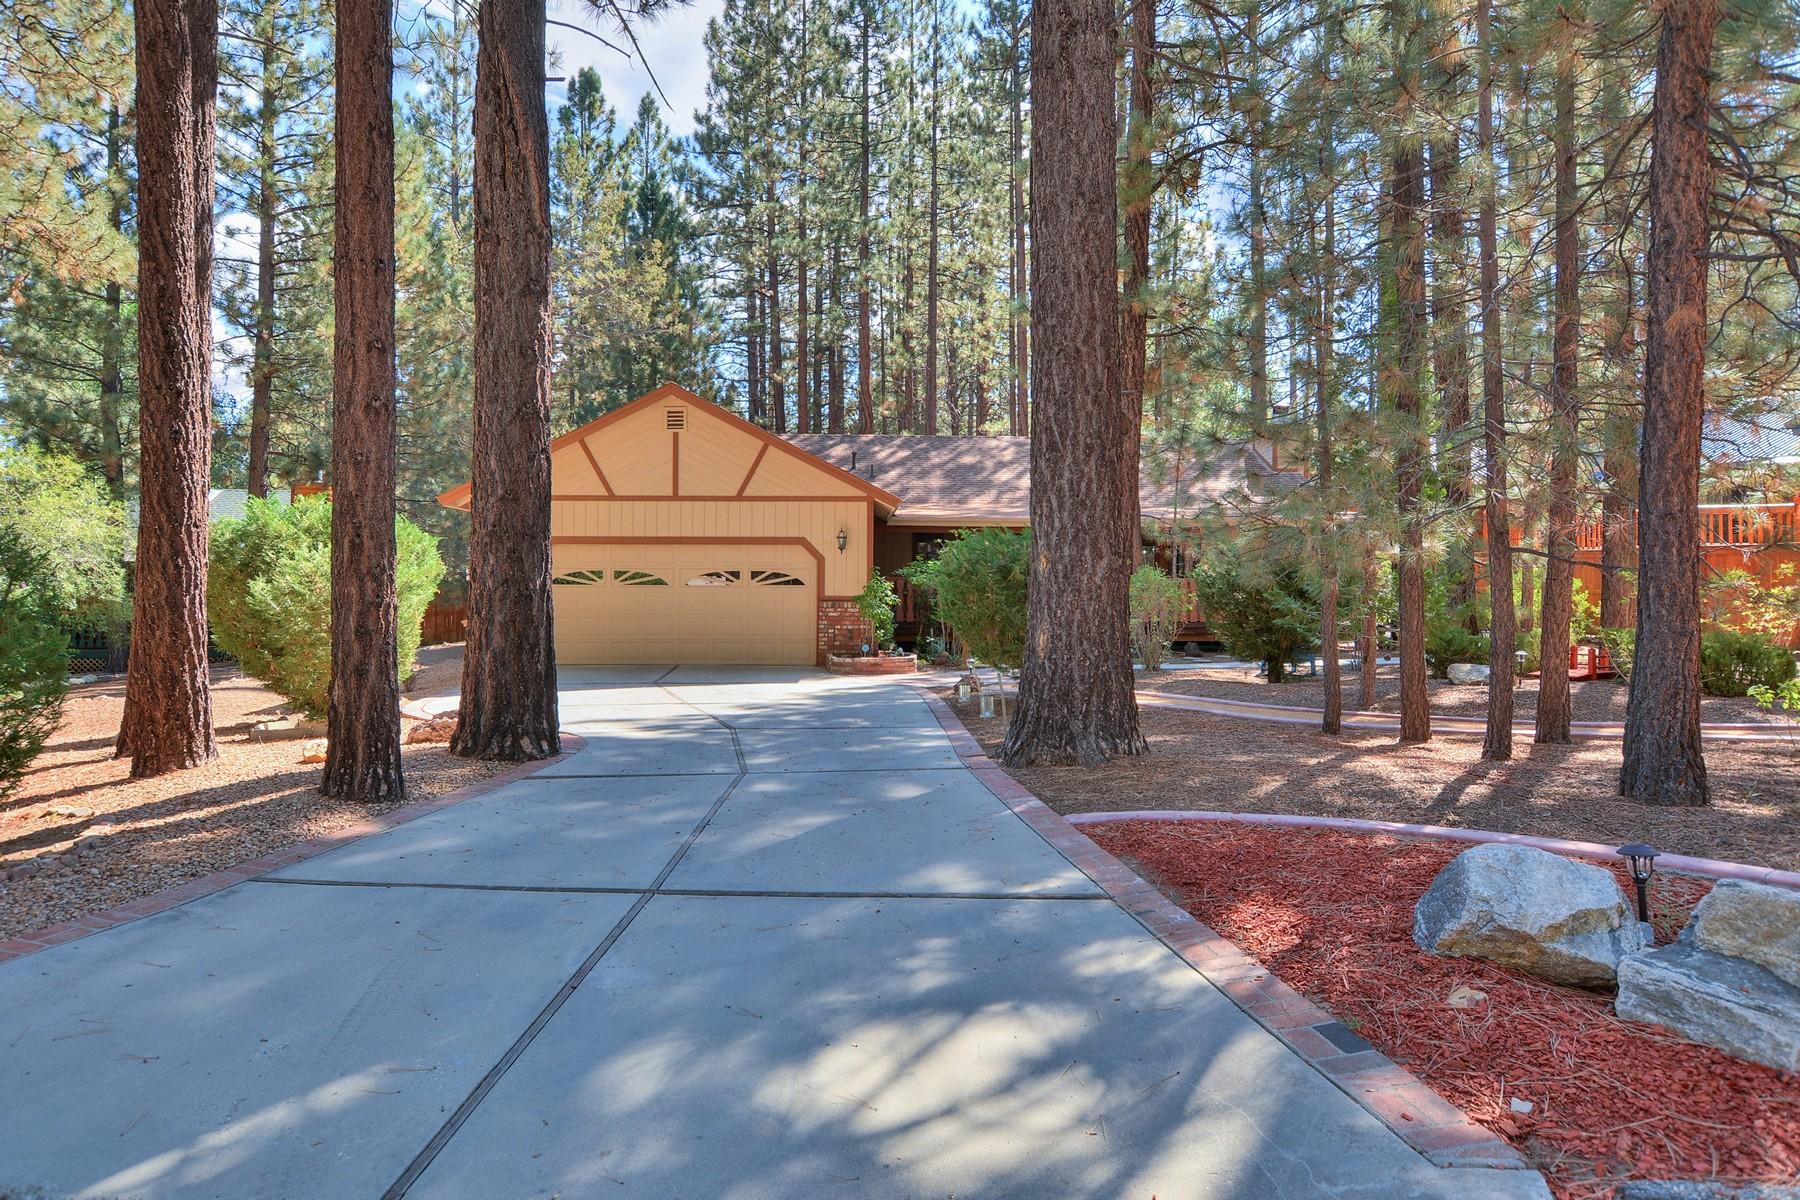 واحد منزل الأسرة للـ Sale في 601 Vail Lane Big Bear Lake, Ca. 92315 Big Bear Lake, California, 92315 United States